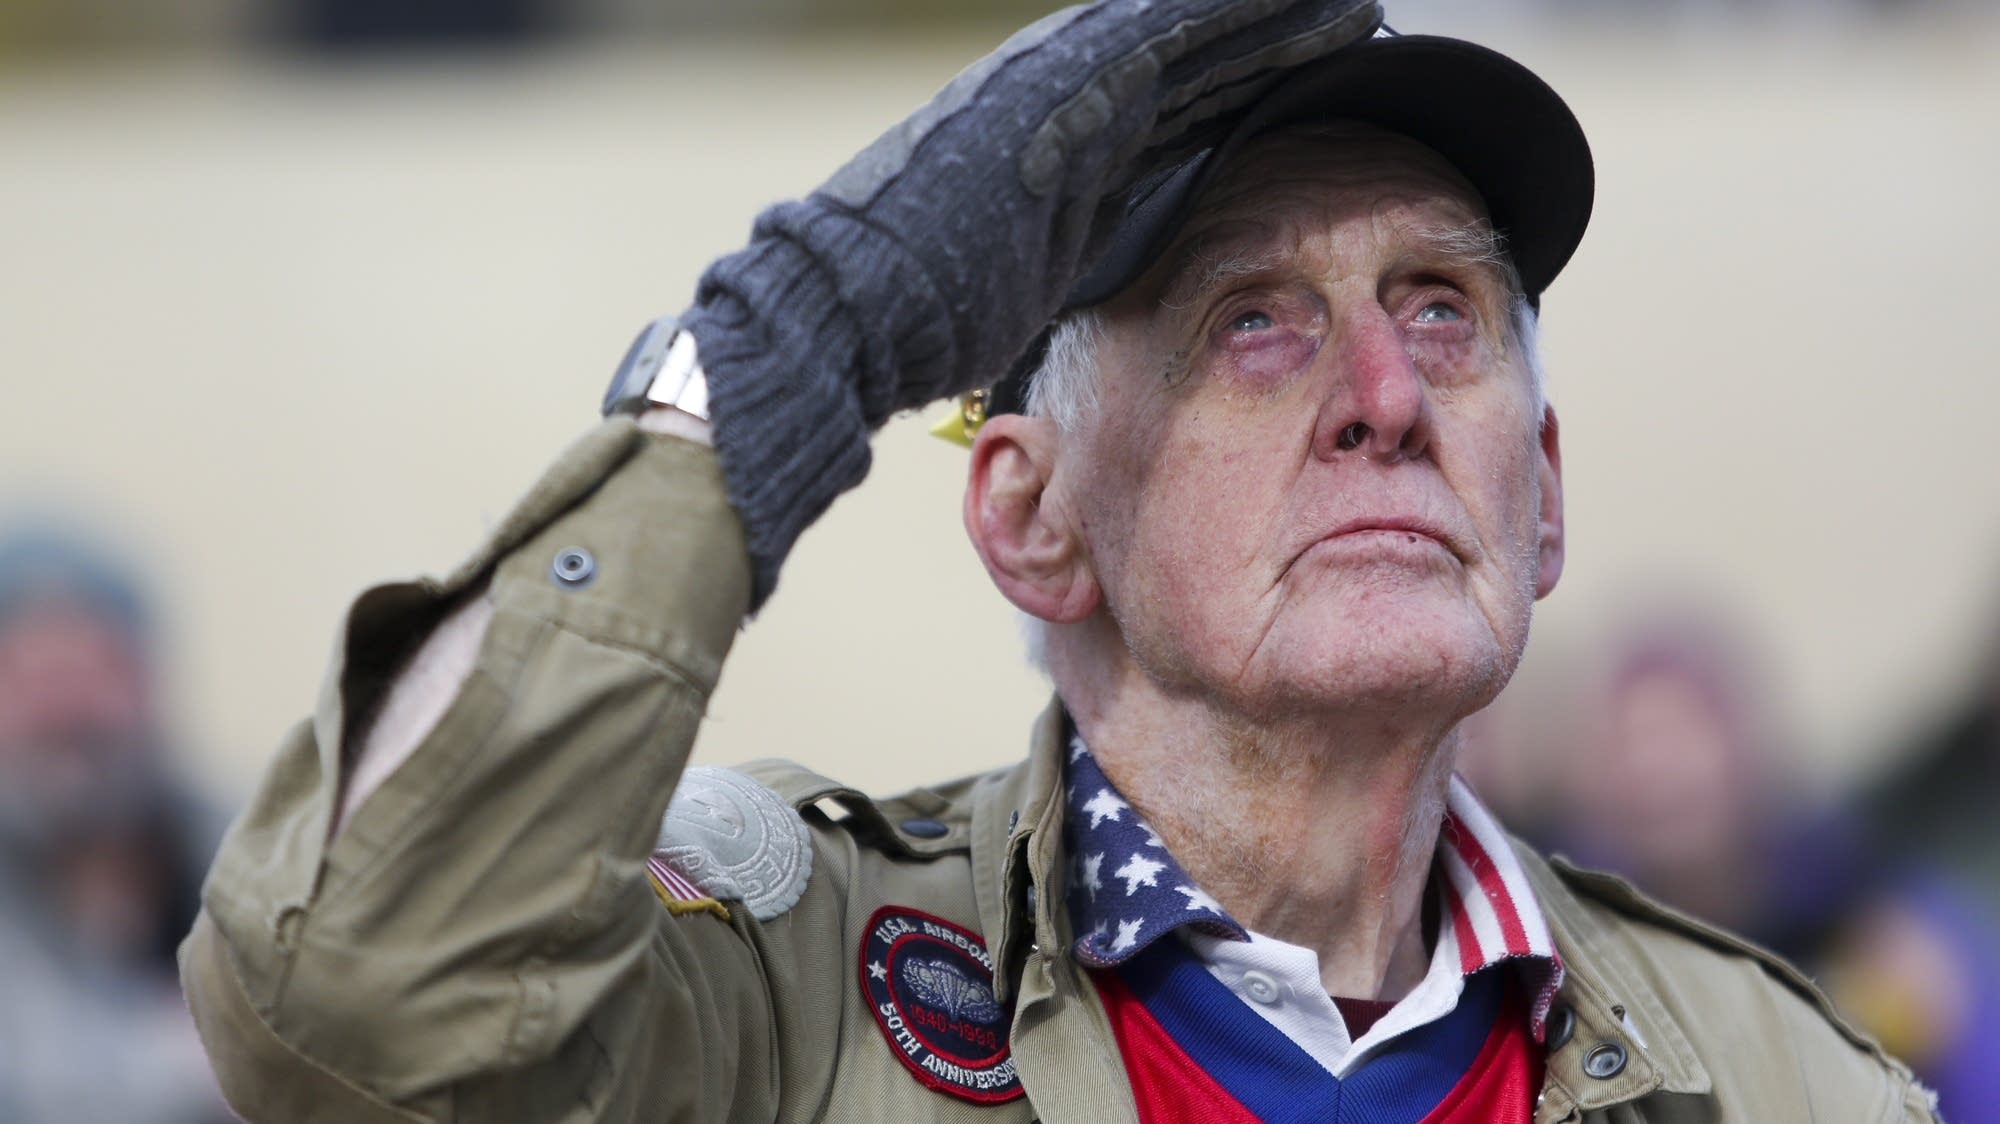 Veteran's Day ceremony at the Vietnam War Memorial